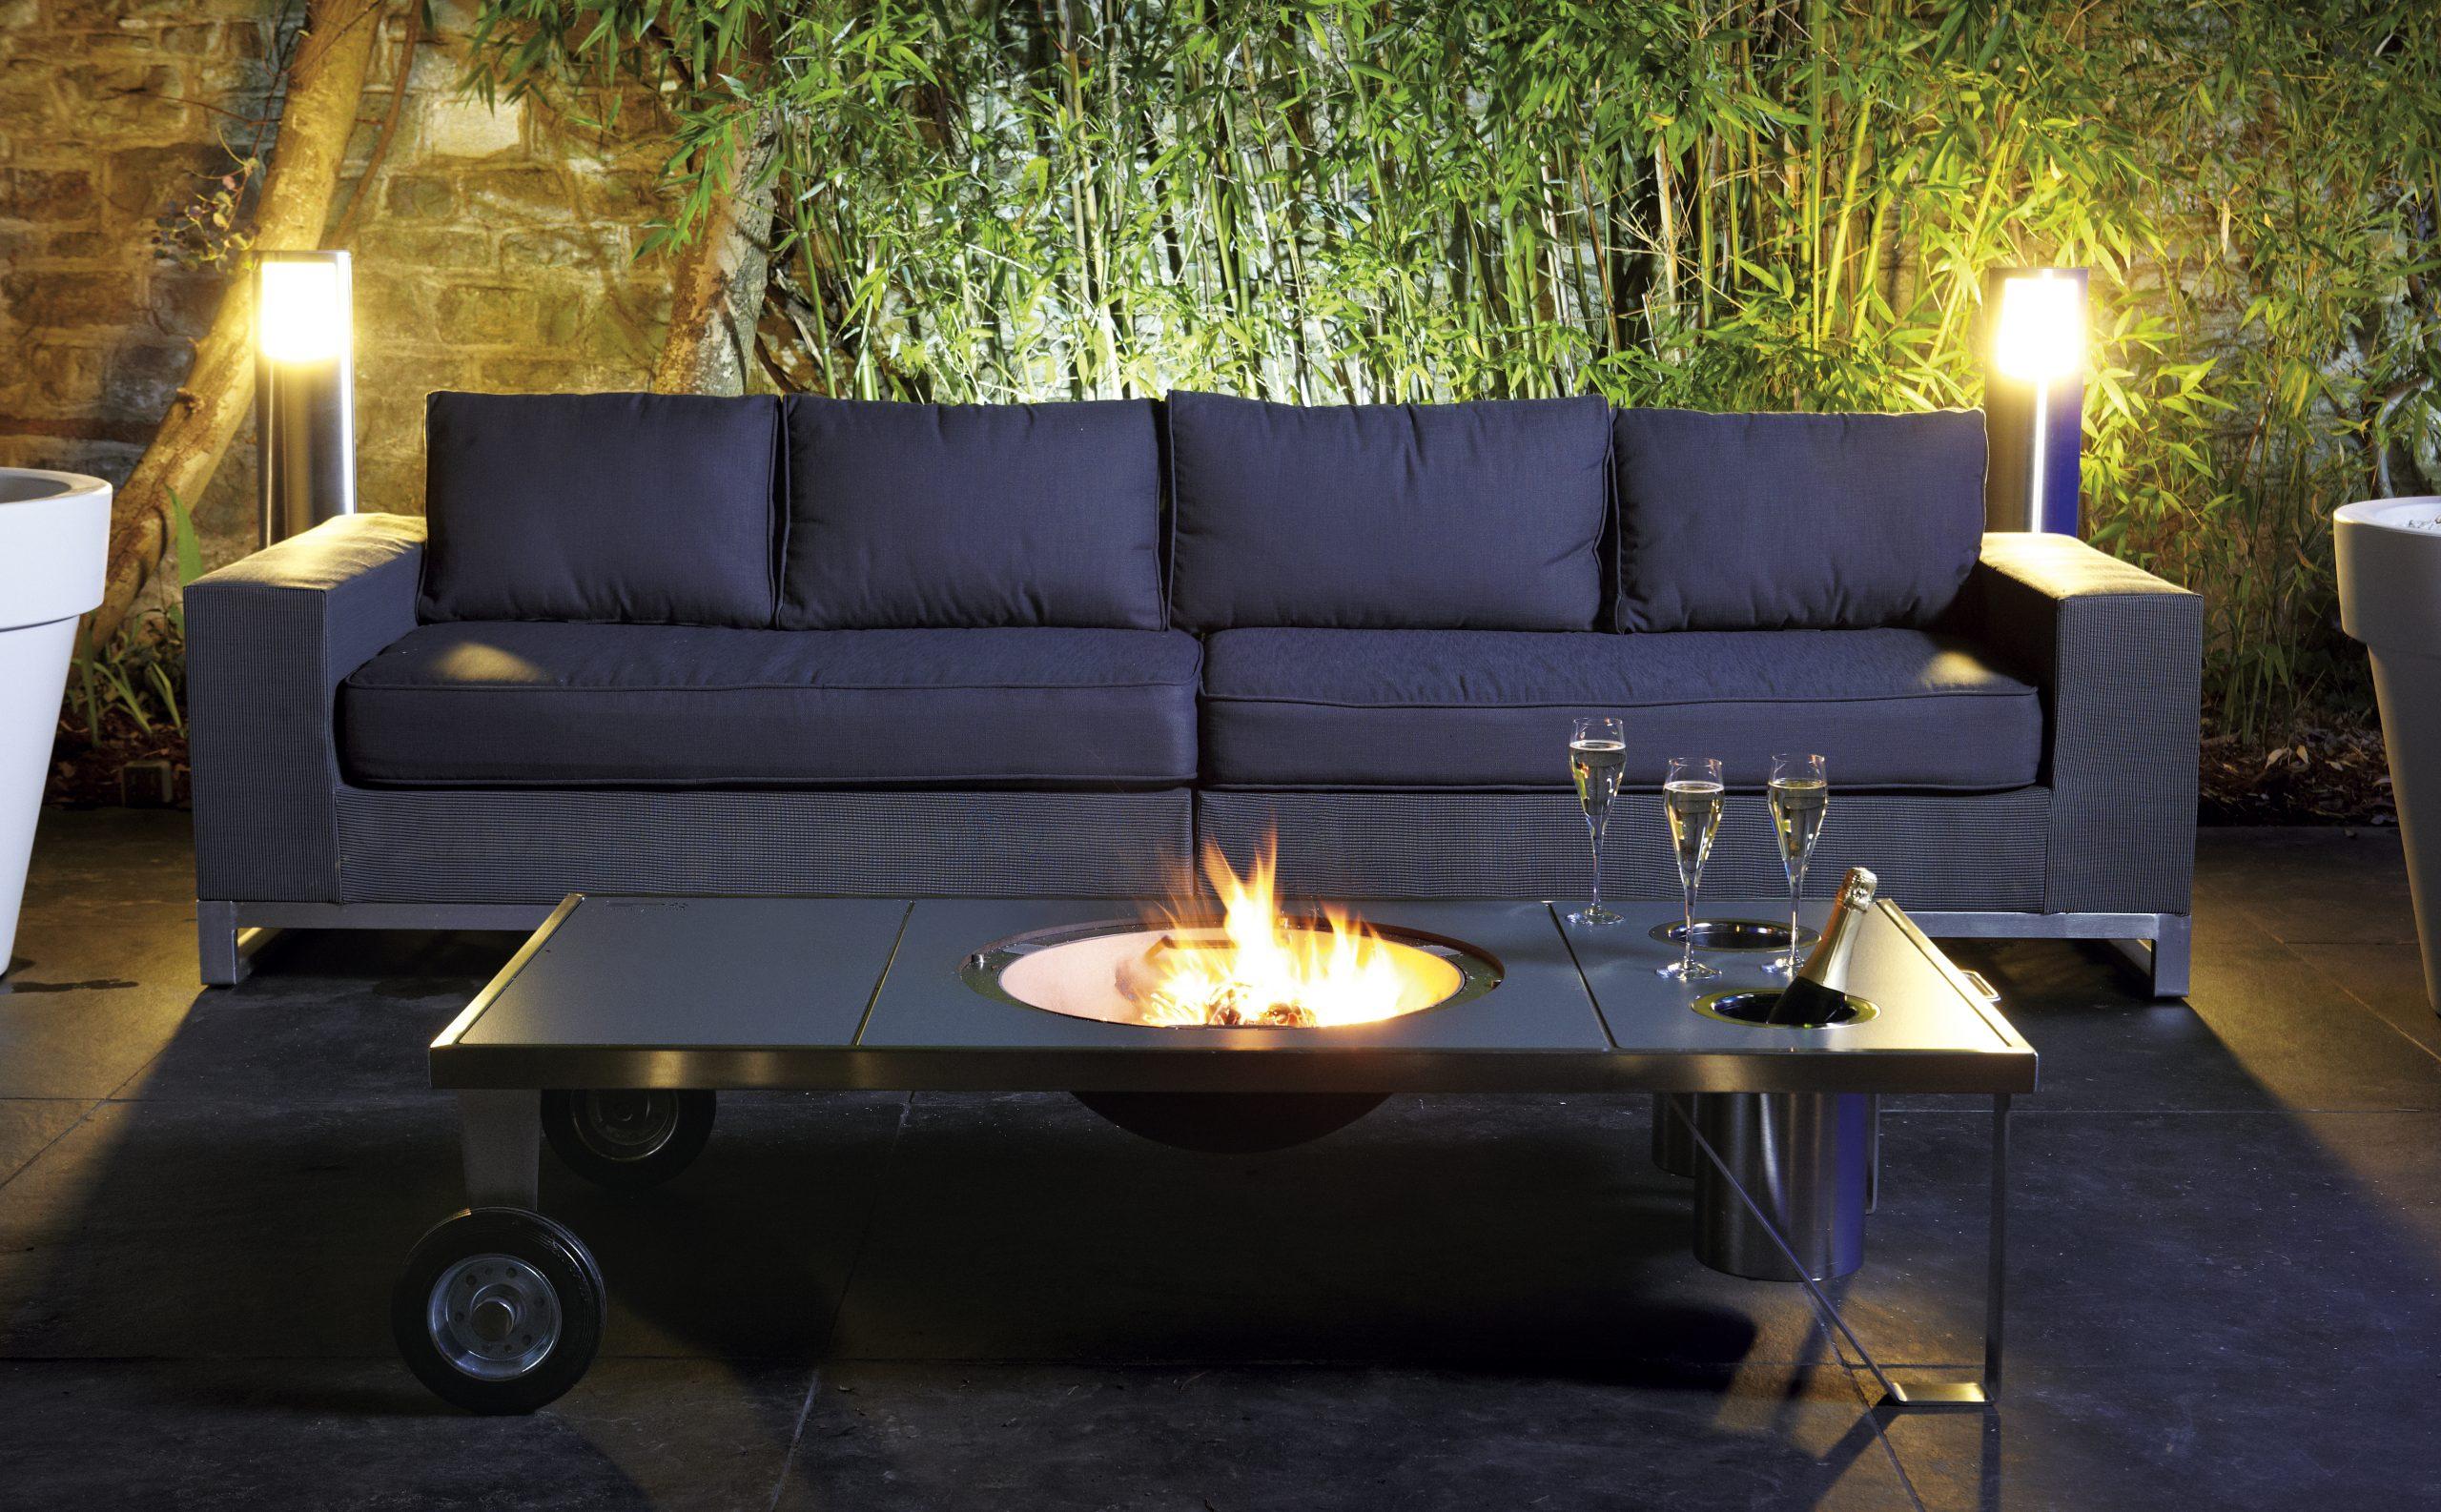 Table brasero mobile et seaux champagne